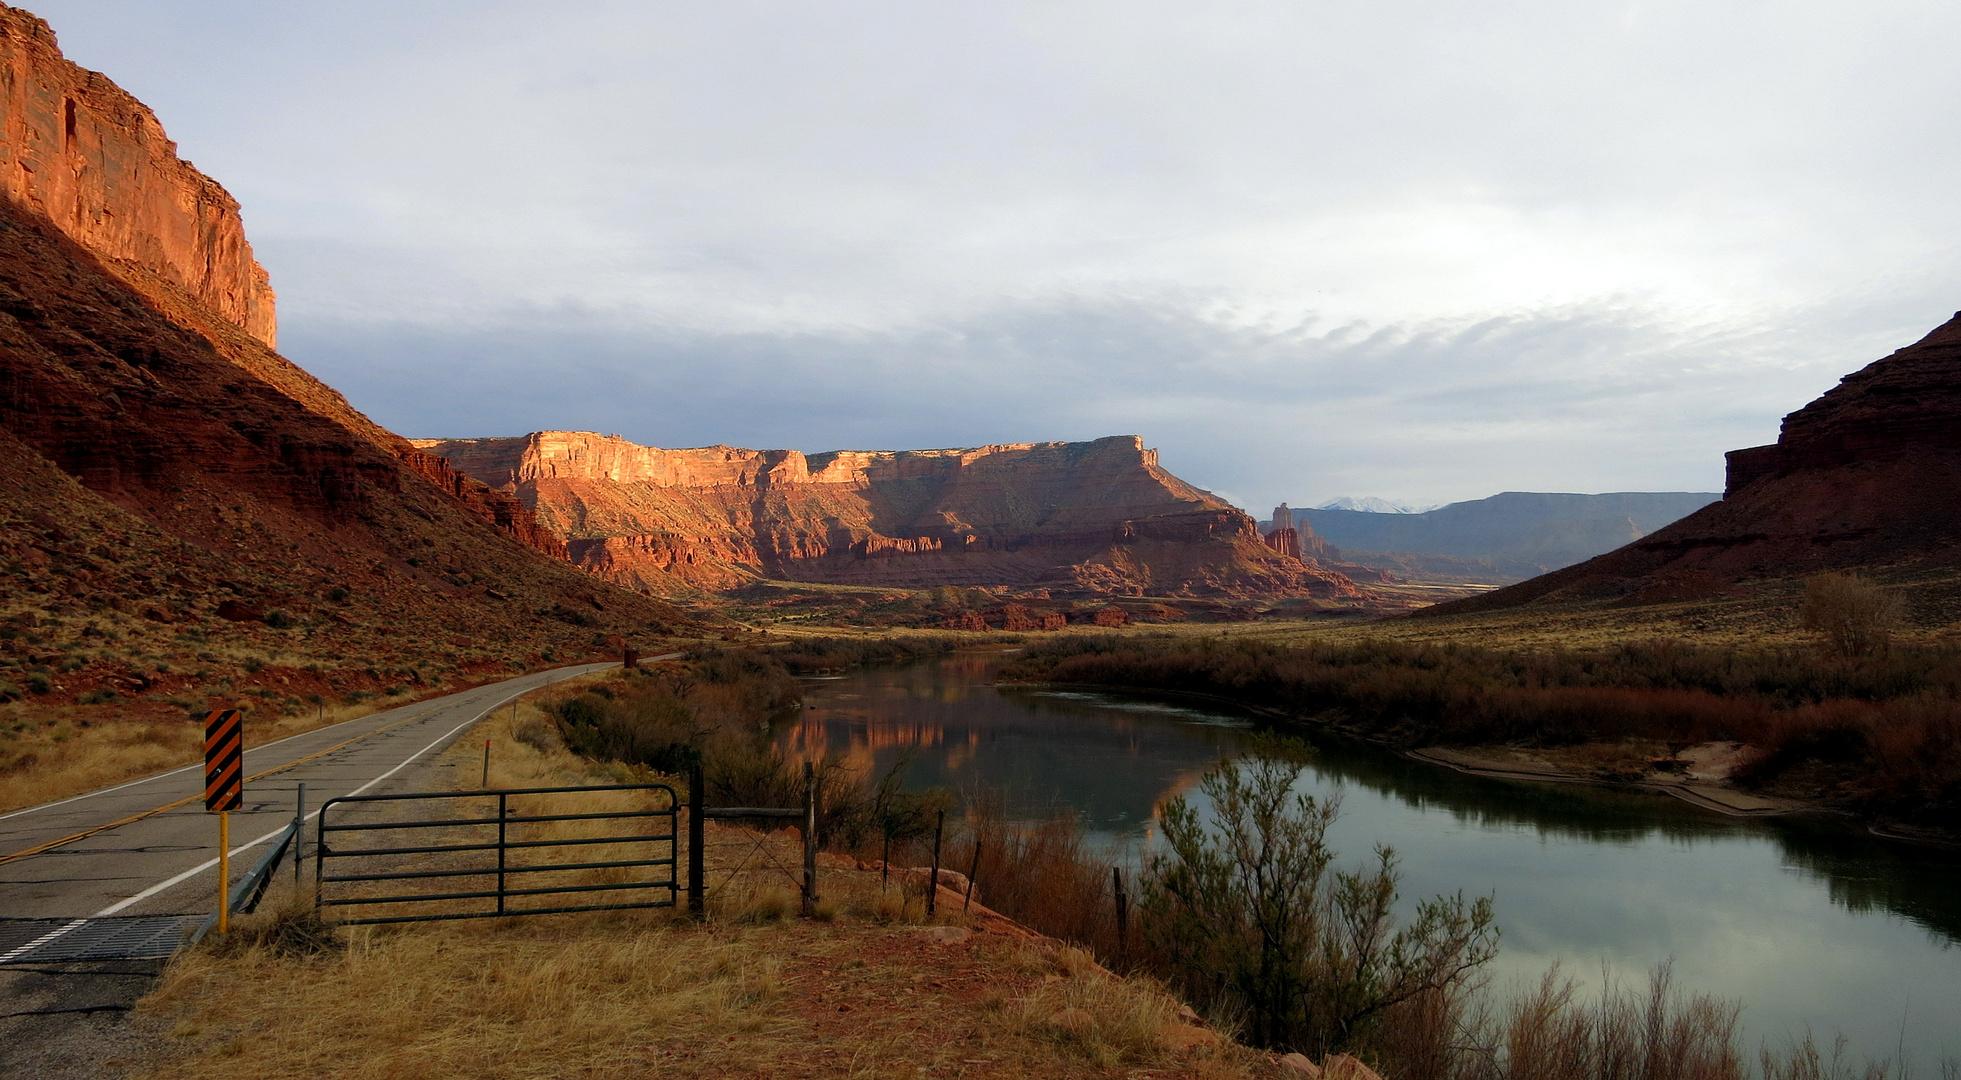 heading to Moab